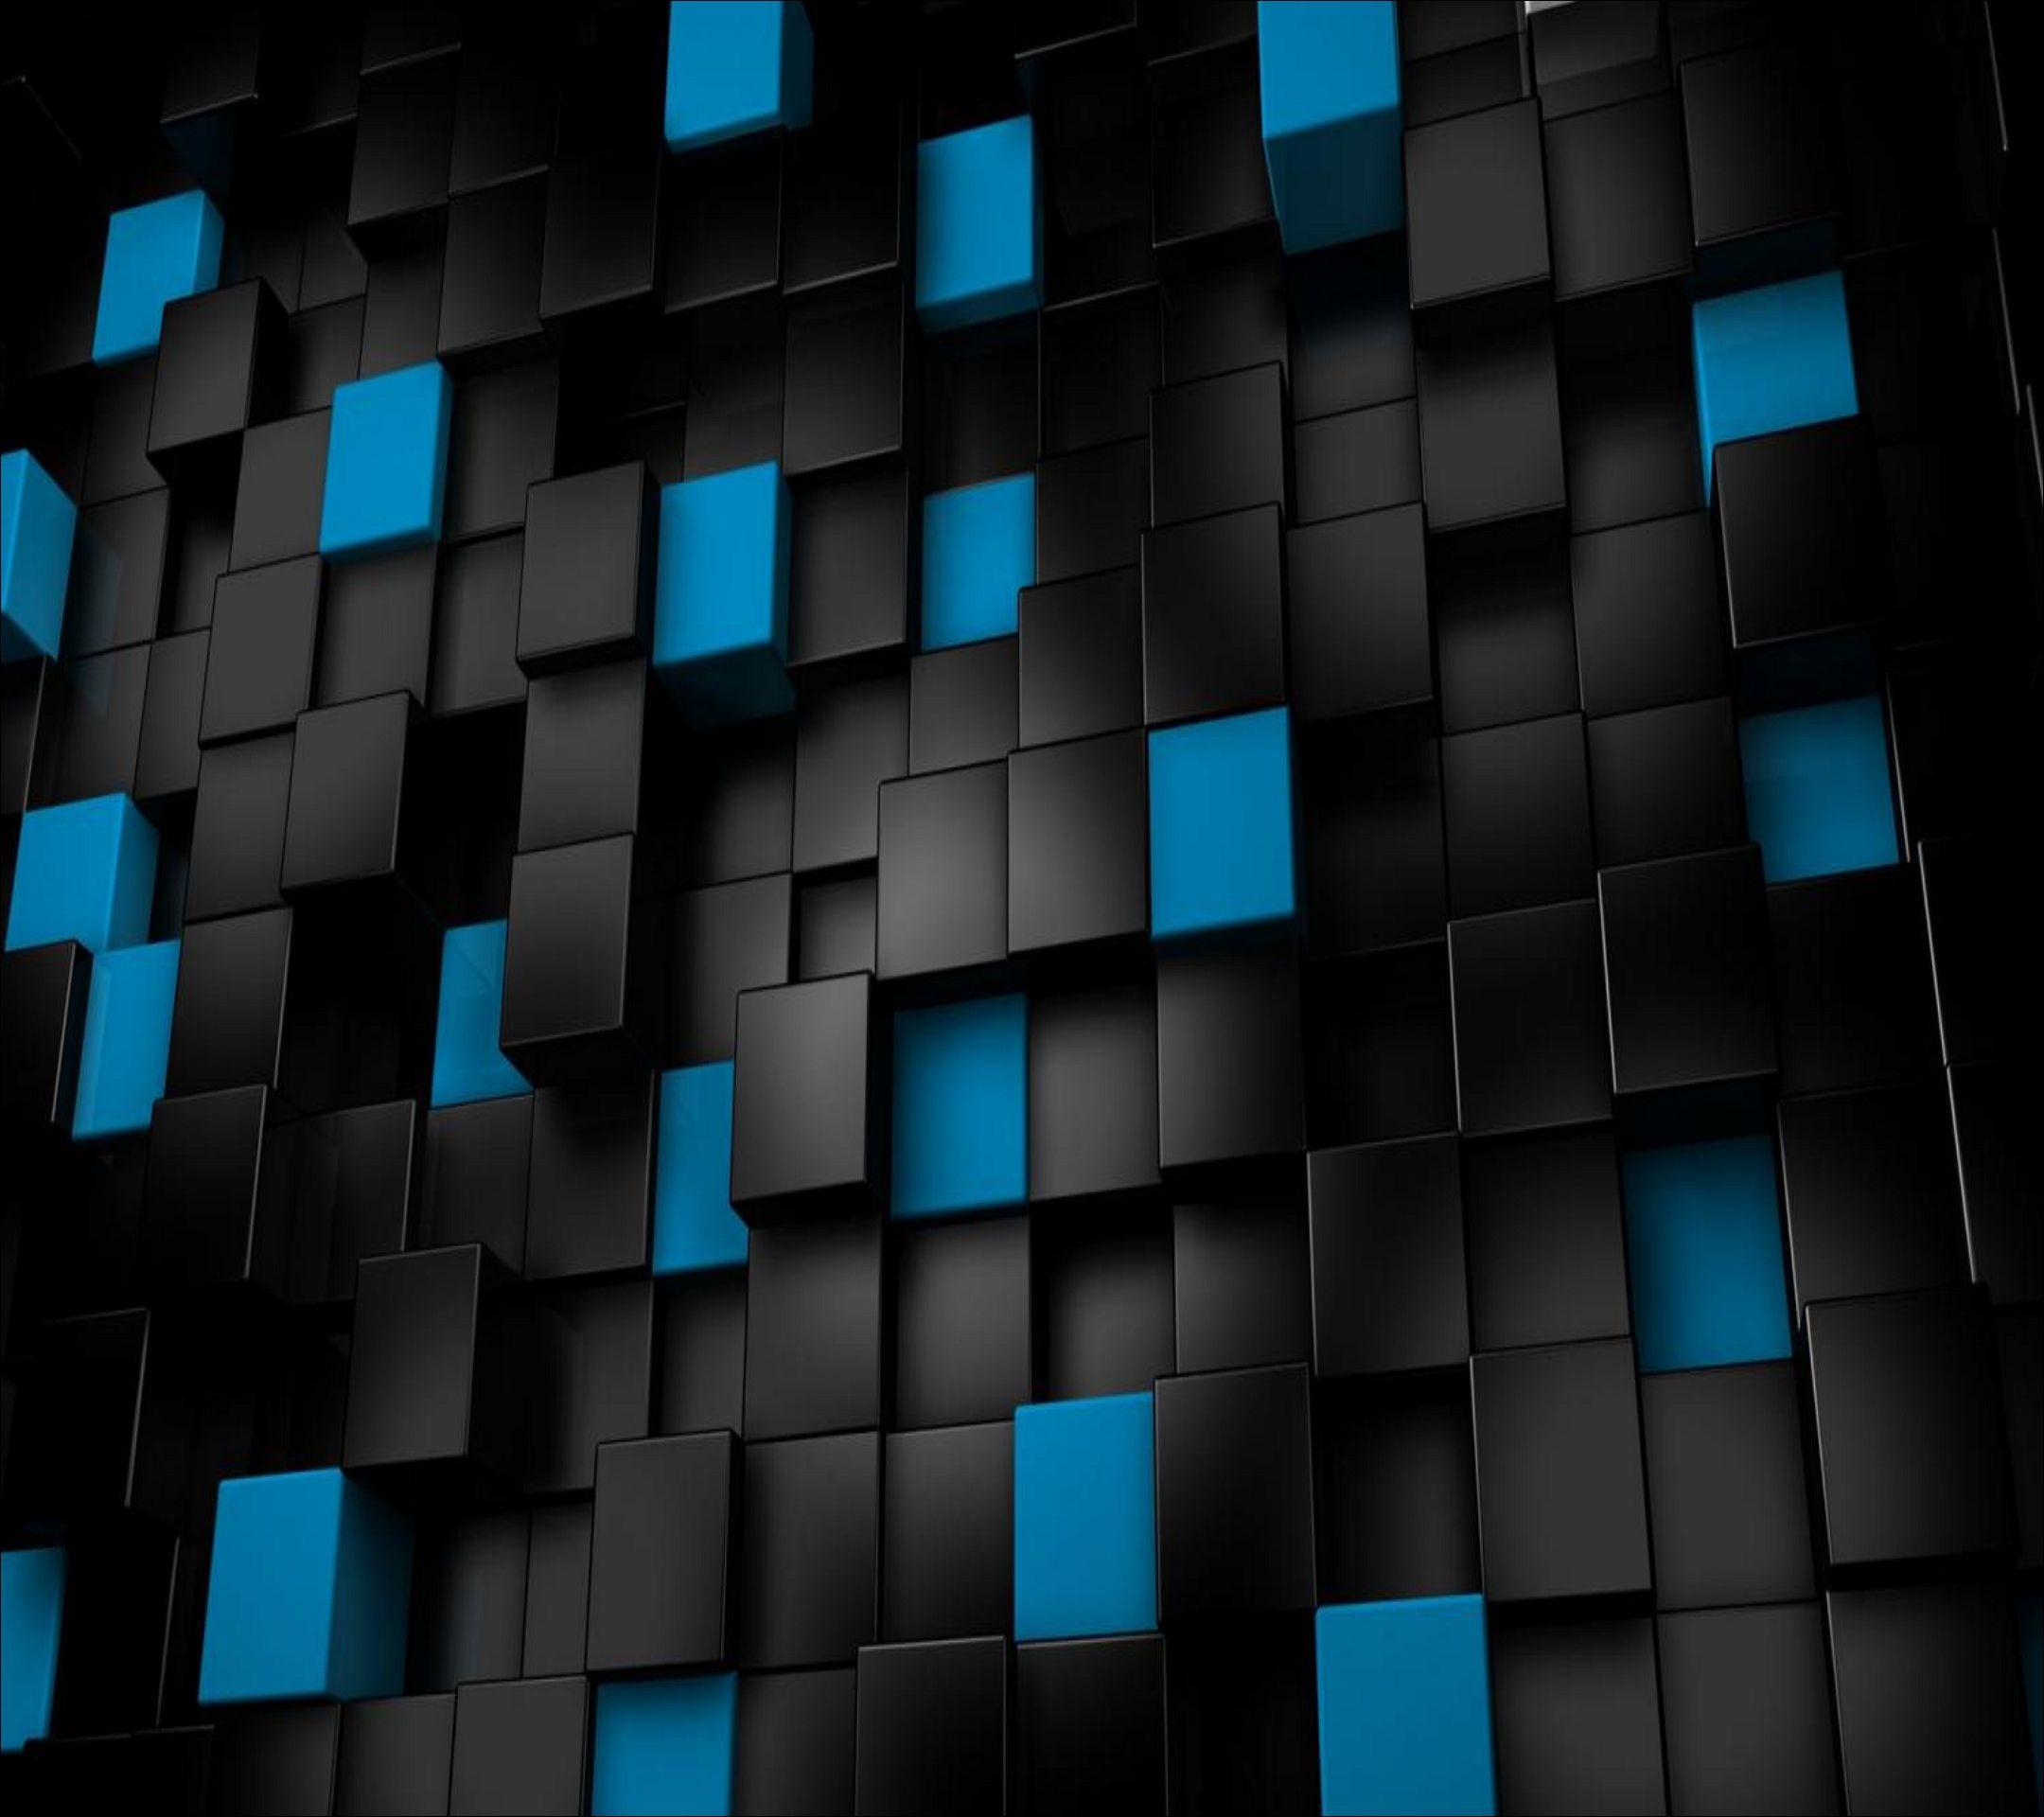 Honeycomb Wallpaper, Iphone 6 Plus Wallpaper